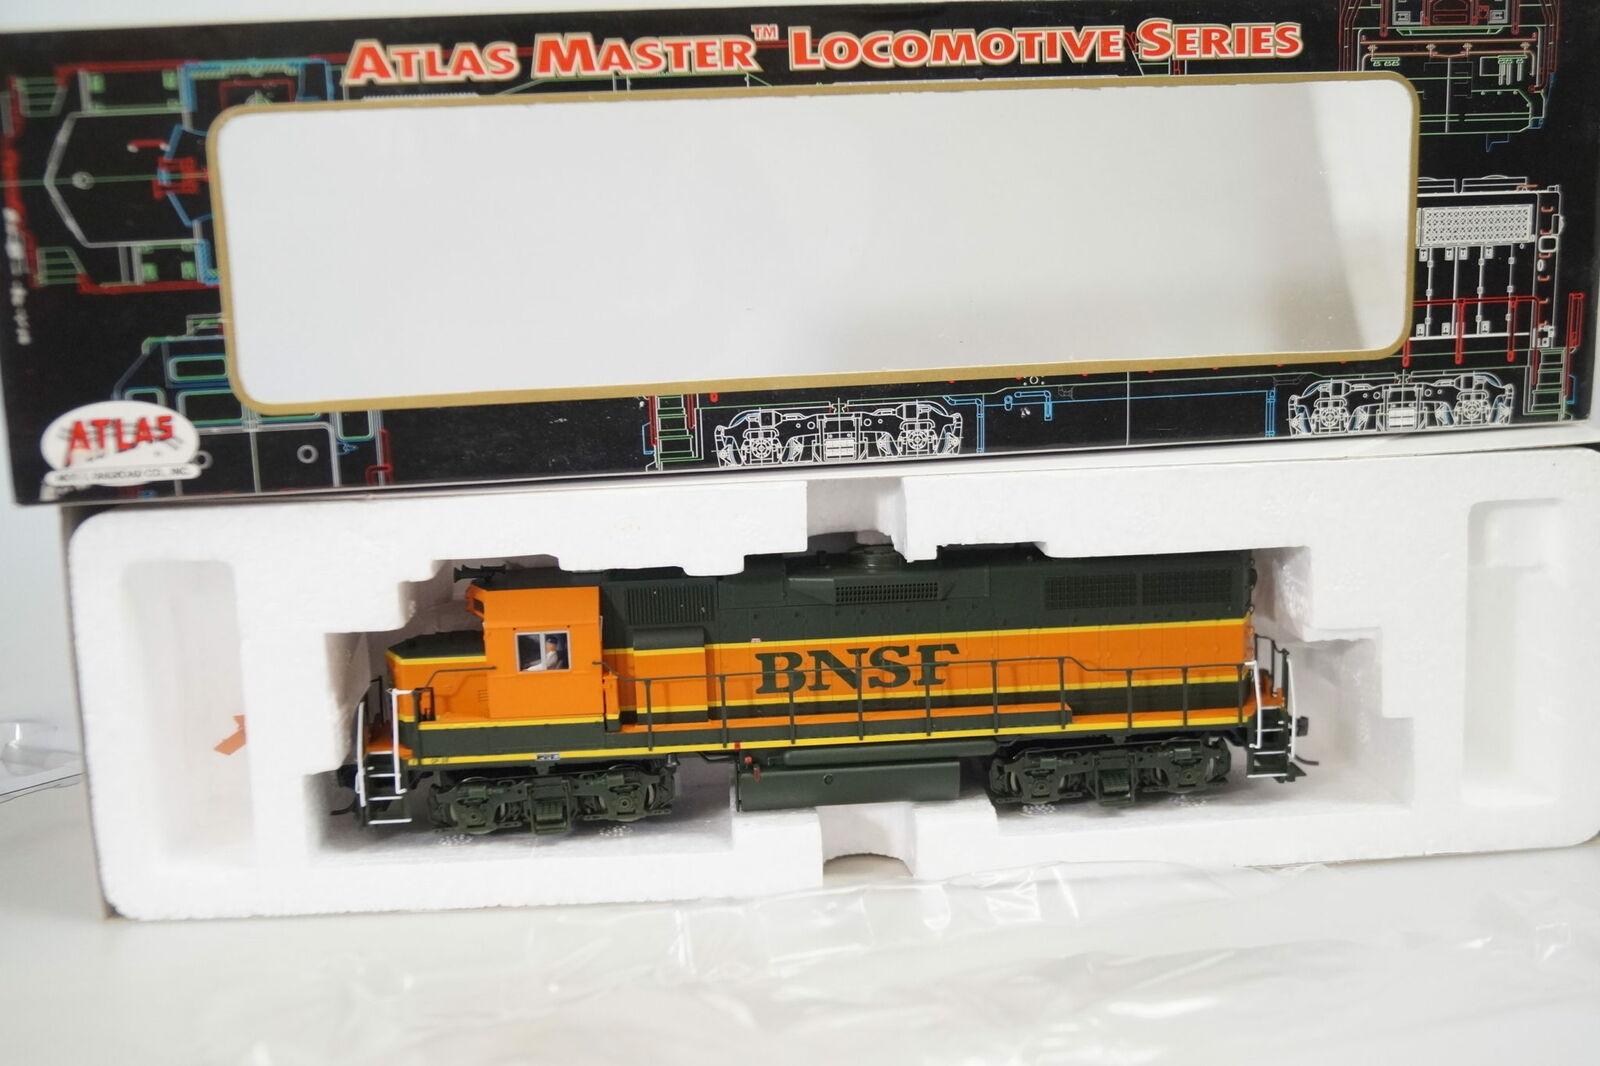 H0  8966 atlas Master us-diesellok gp-38 BNSF, mercancía nueva embalaje original DCC